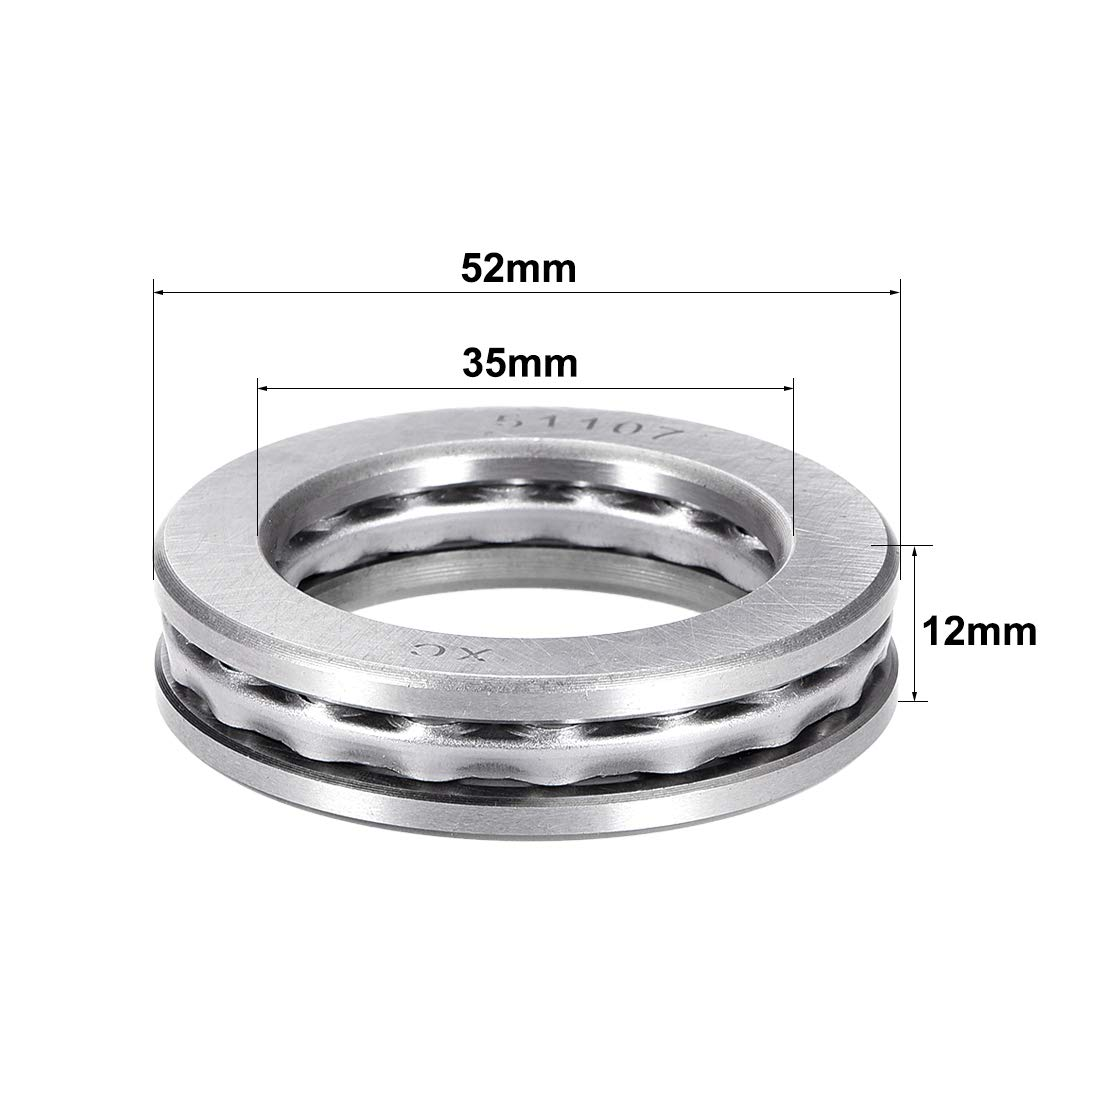 uxcell 51107 Single Direction Thrust Ball Bearings Flat Seat Chromium Steel,35x52x12mm 1pcs